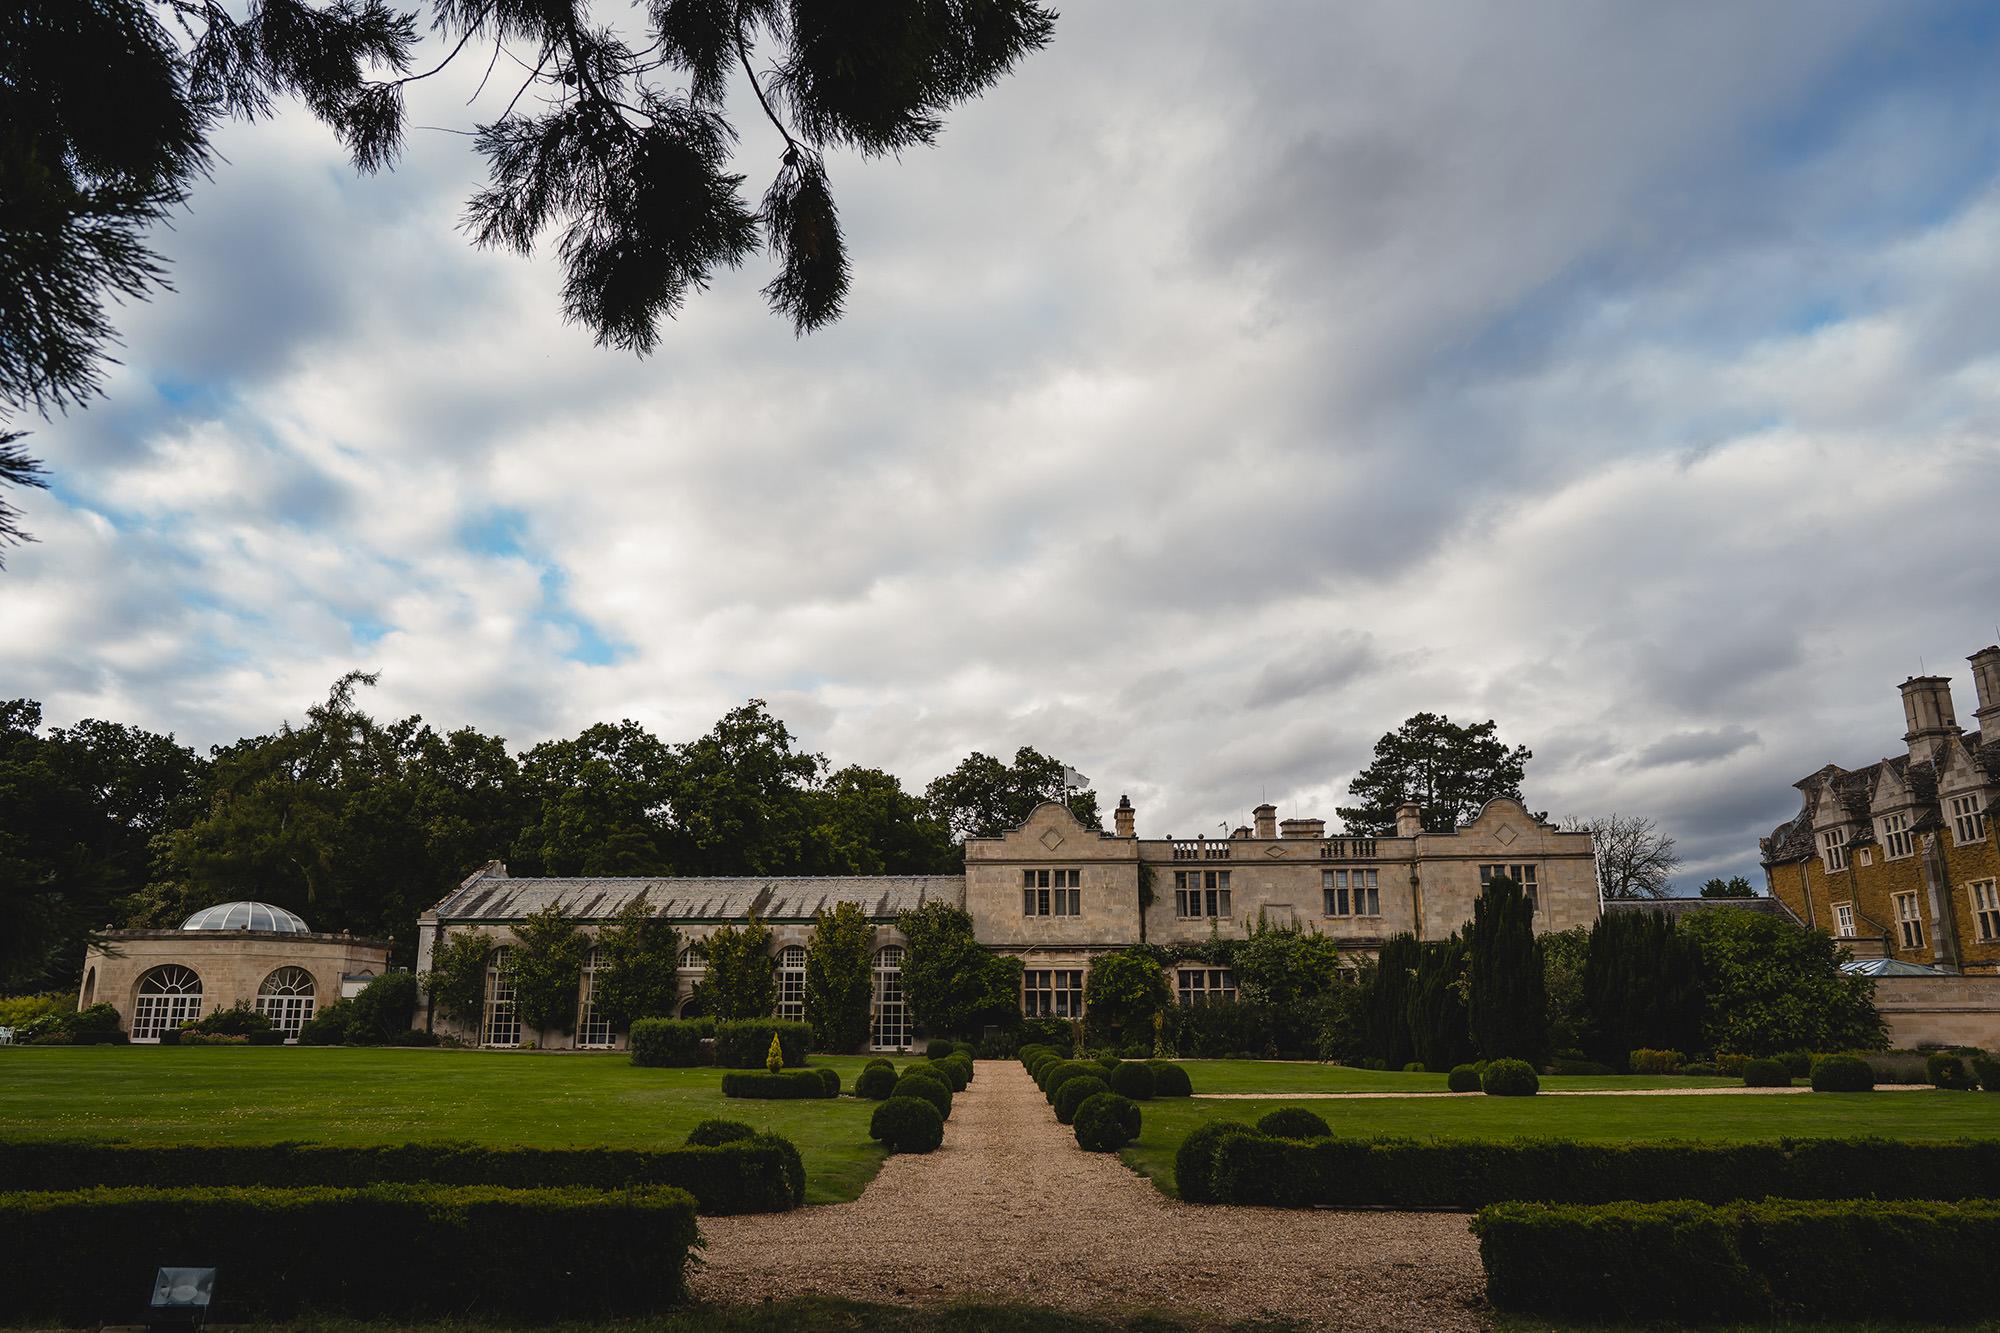 grounds of stapleford park